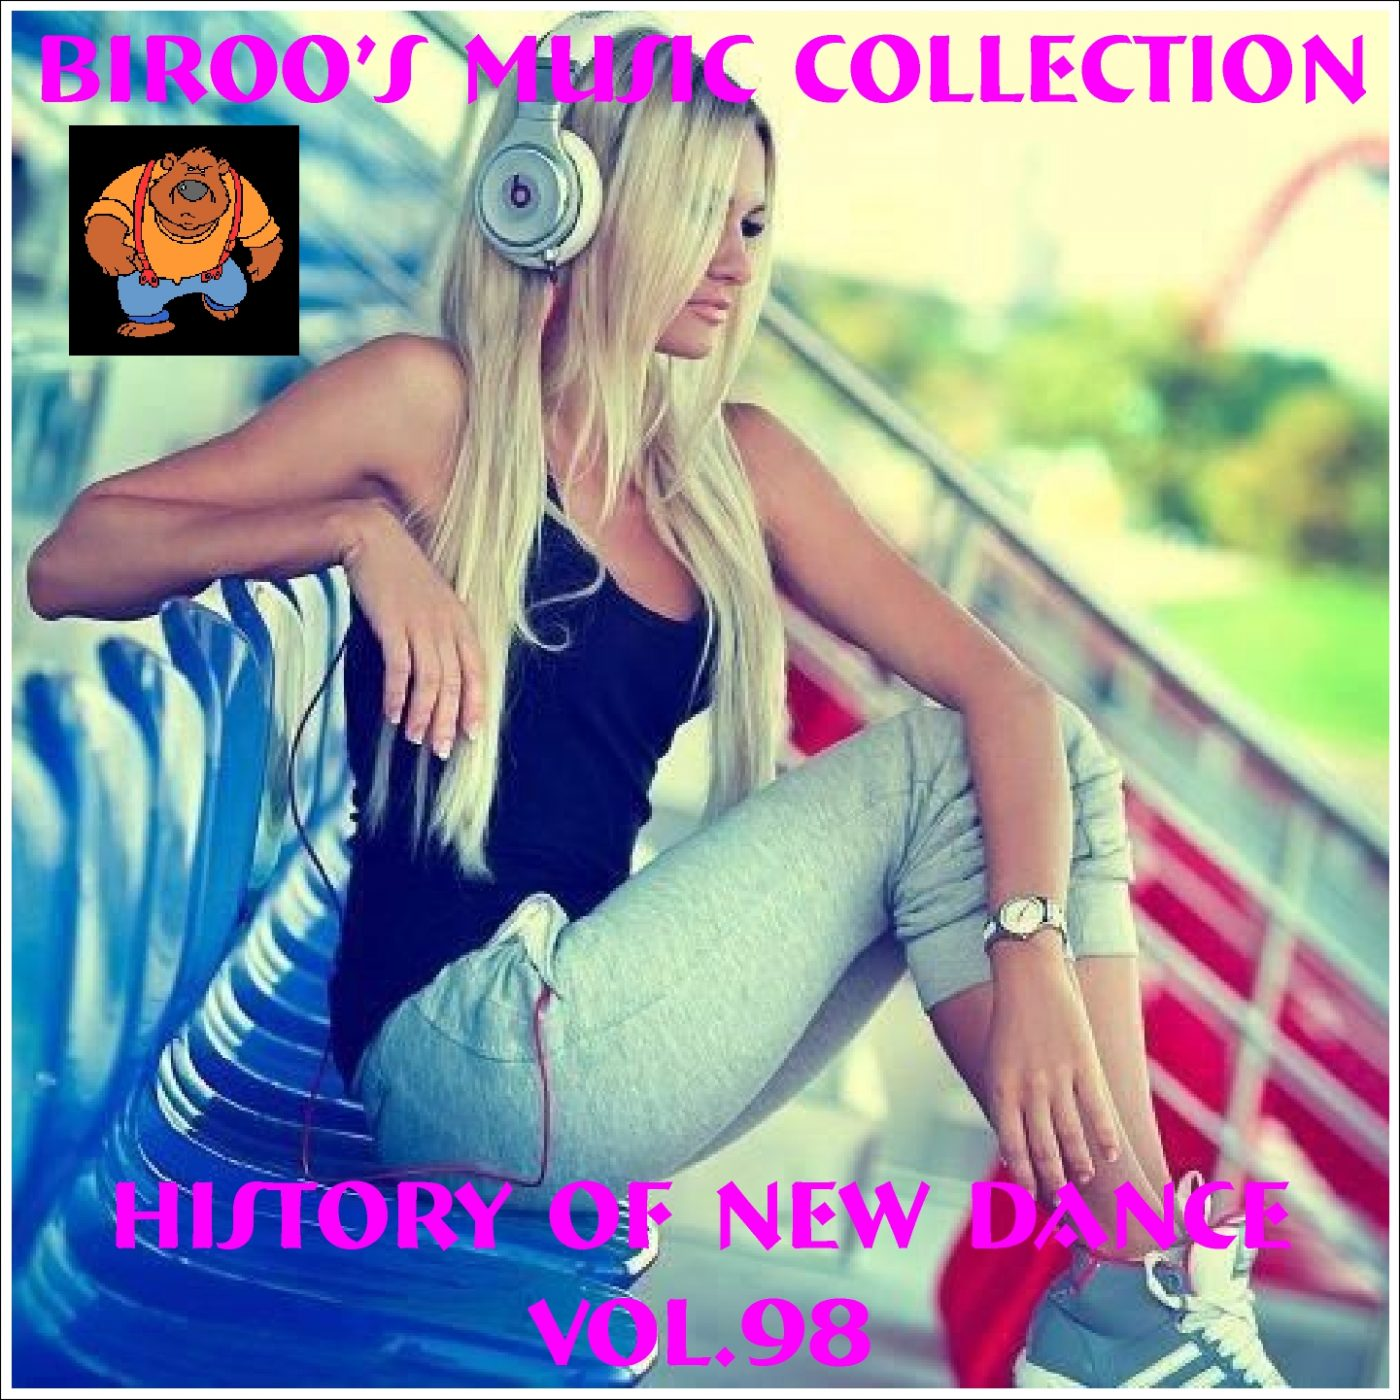 History Of New Dance Vol.98 (2020)